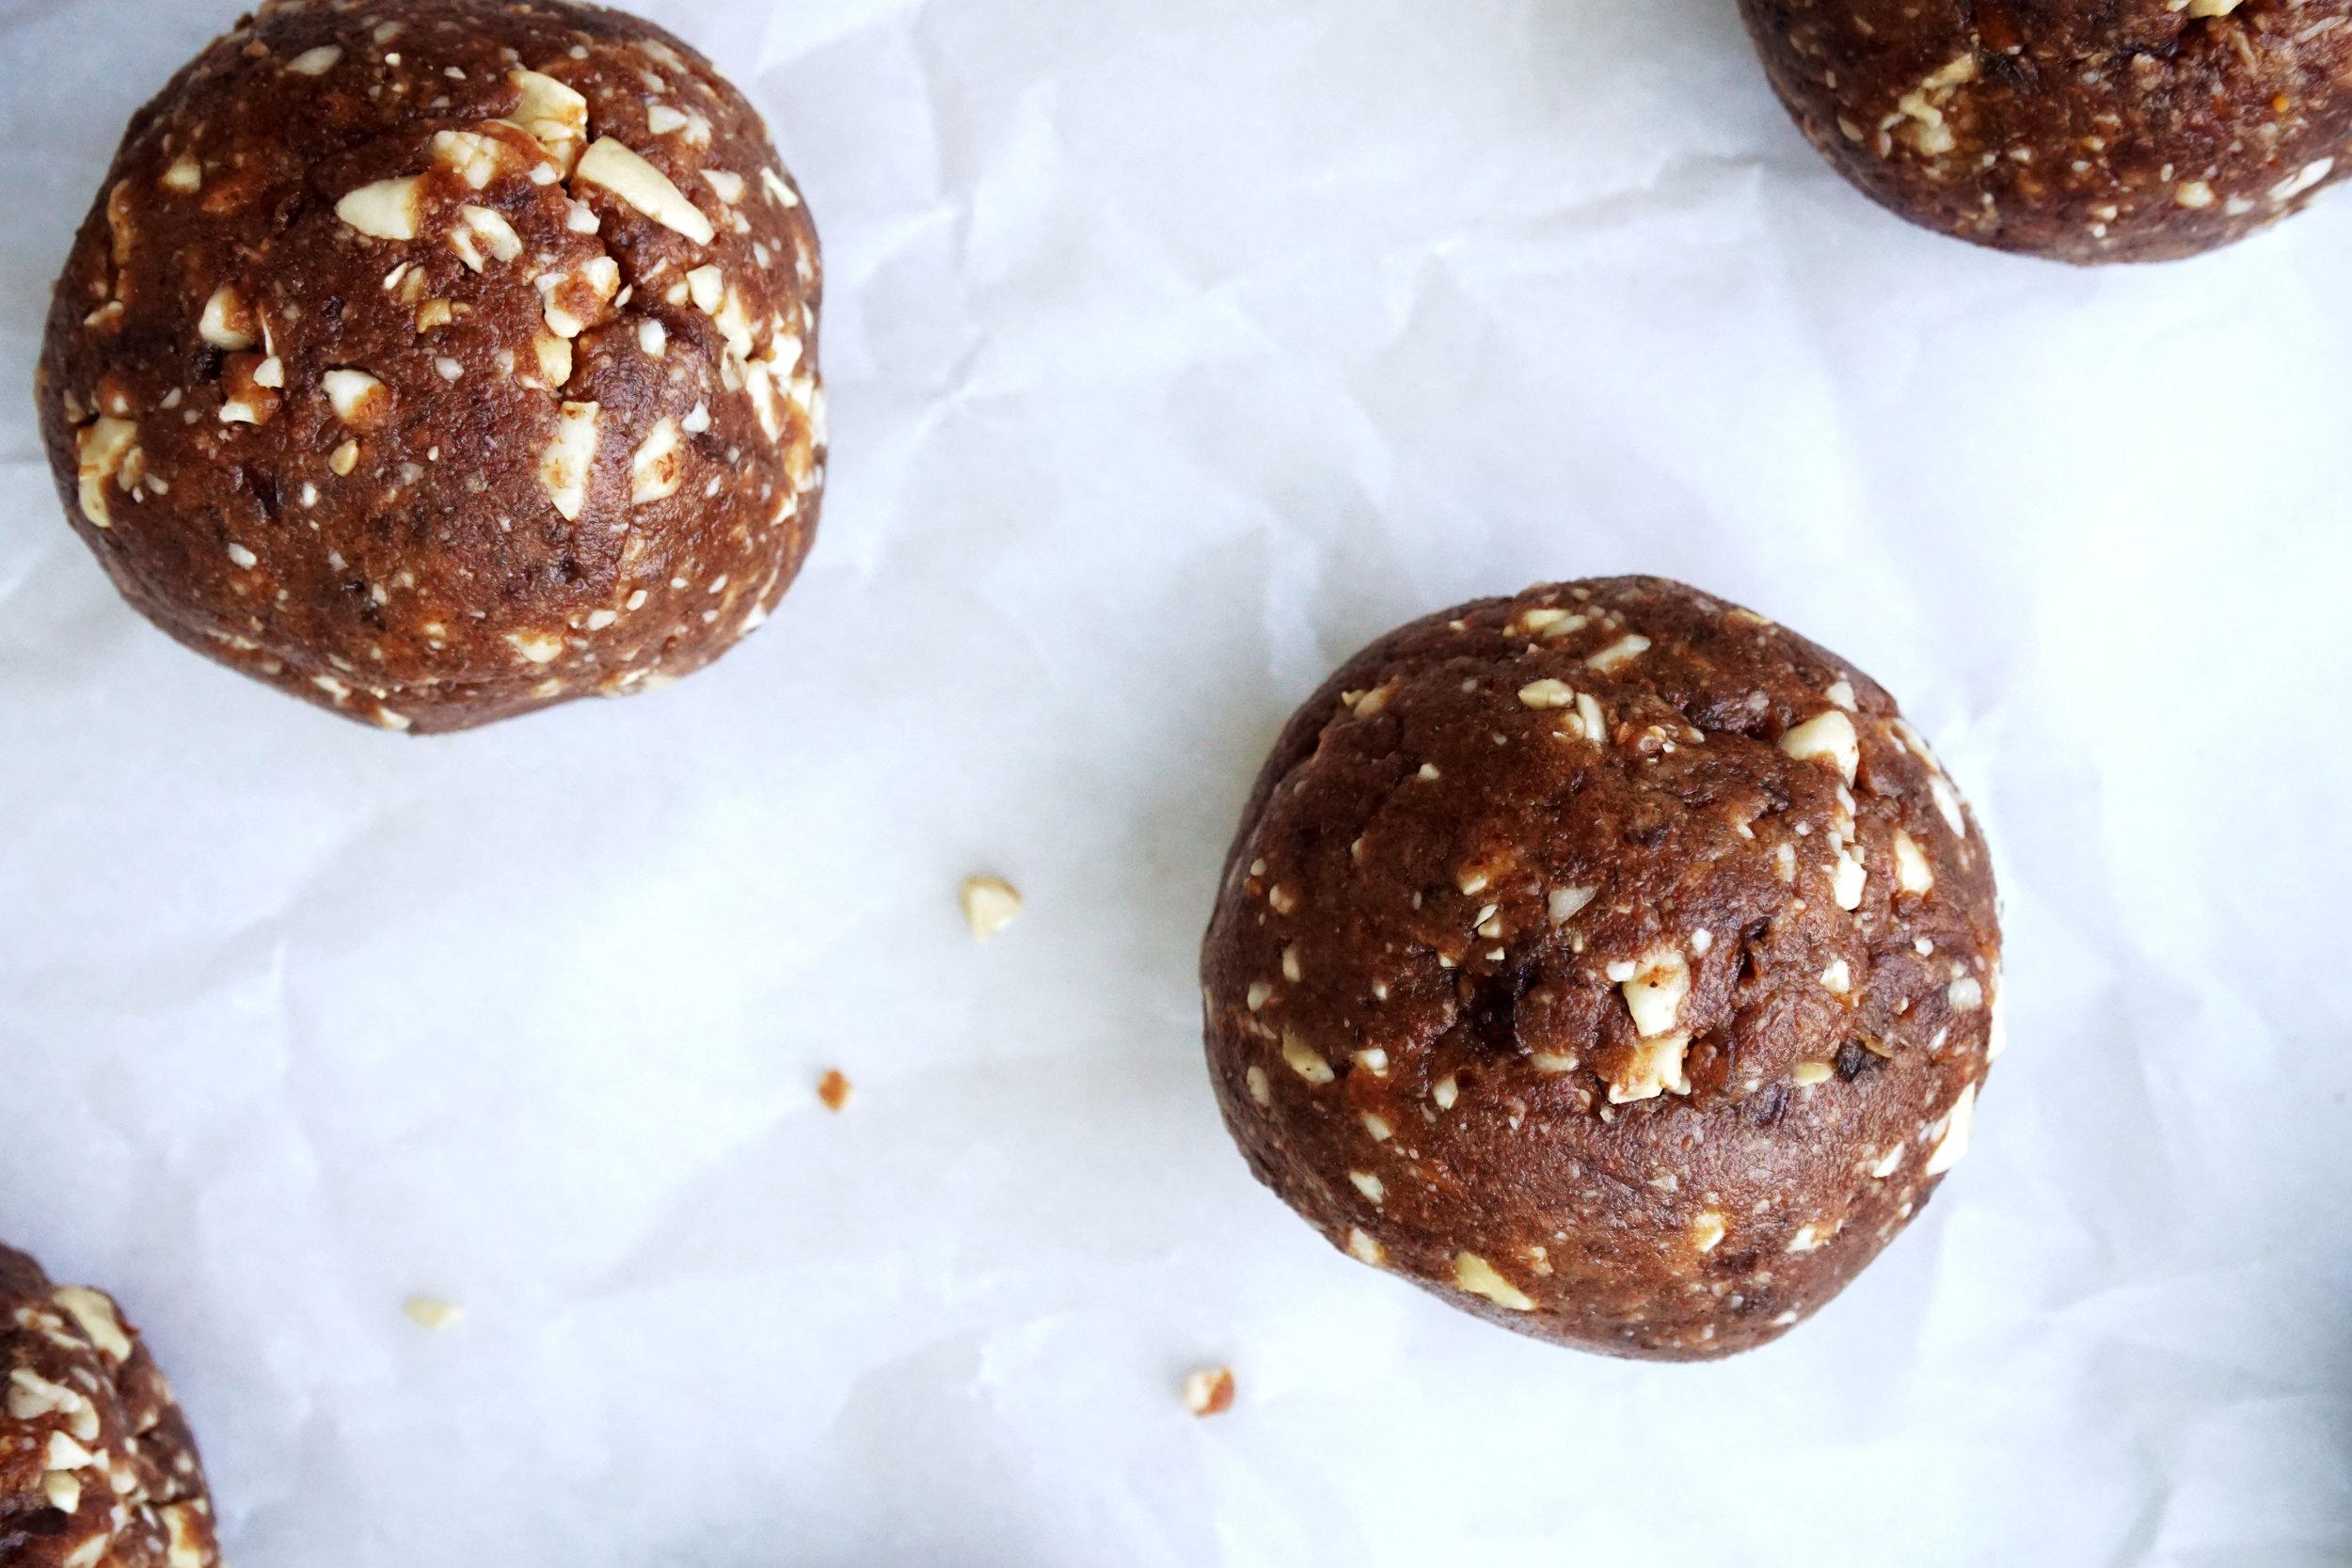 Salted Almond Butter Cacao Cashew Bites (Paleo, GF, Vegan)